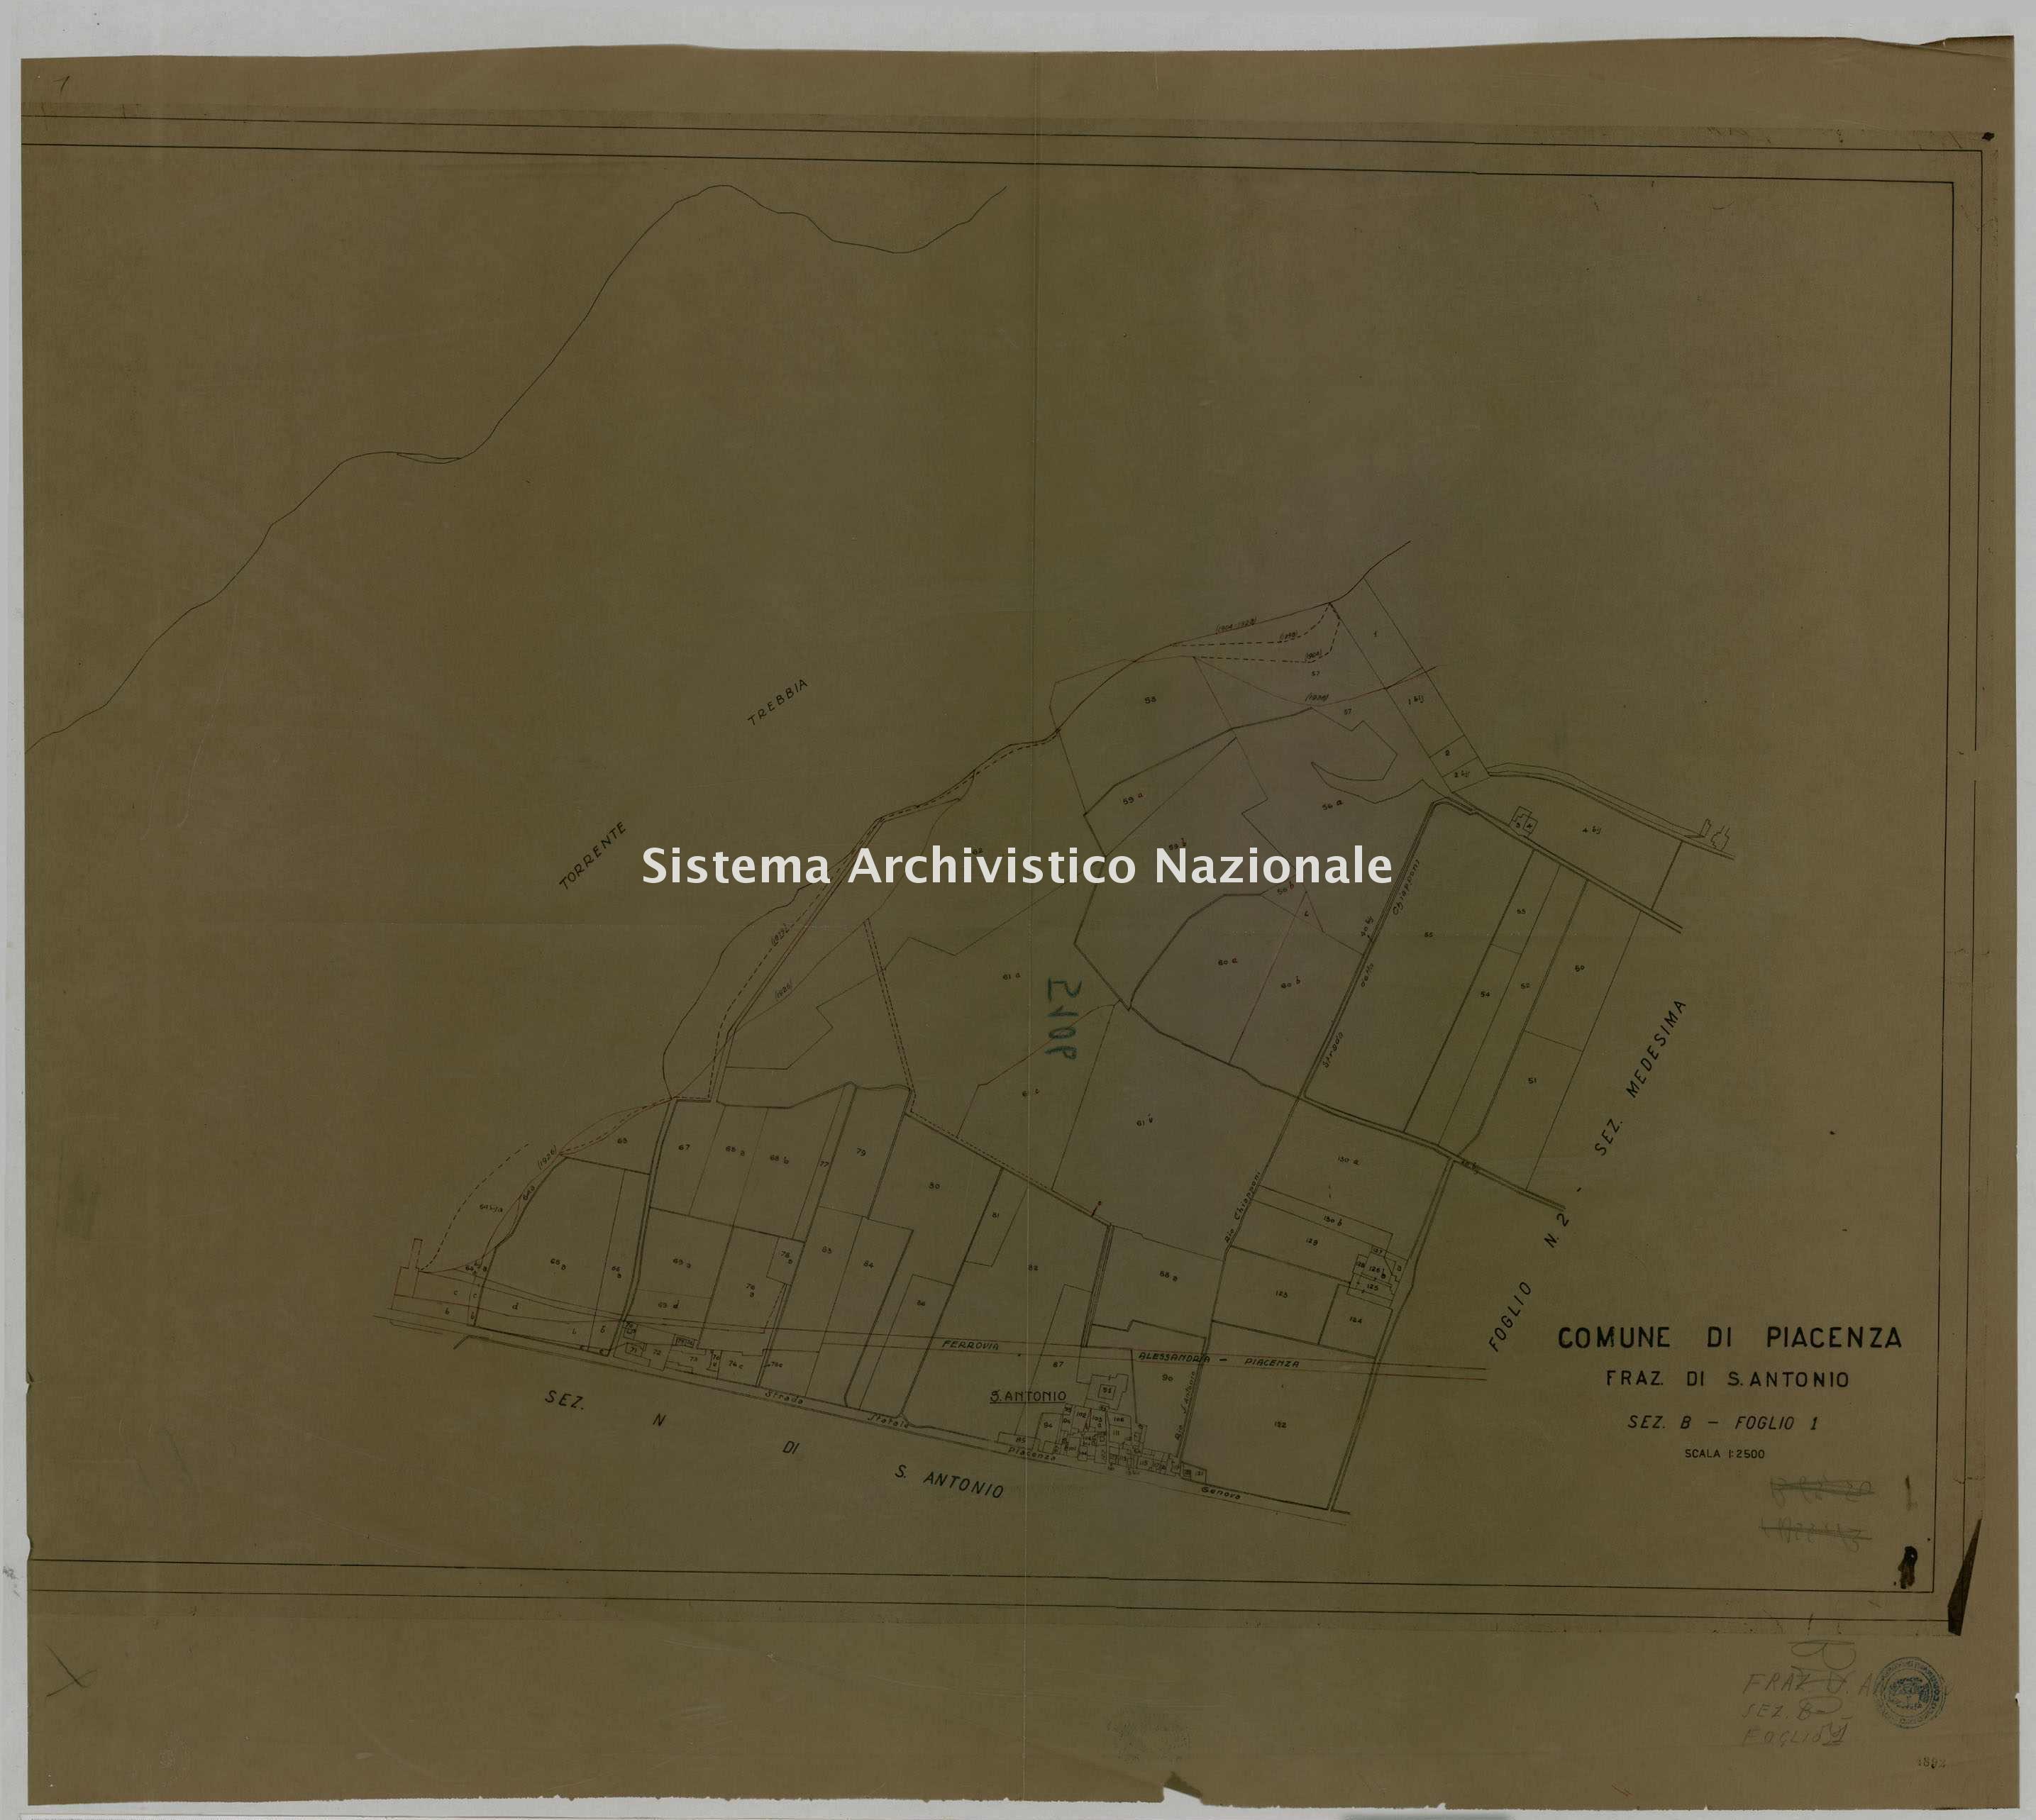 ASPC Mappe, stampe e disegni, n. 5106